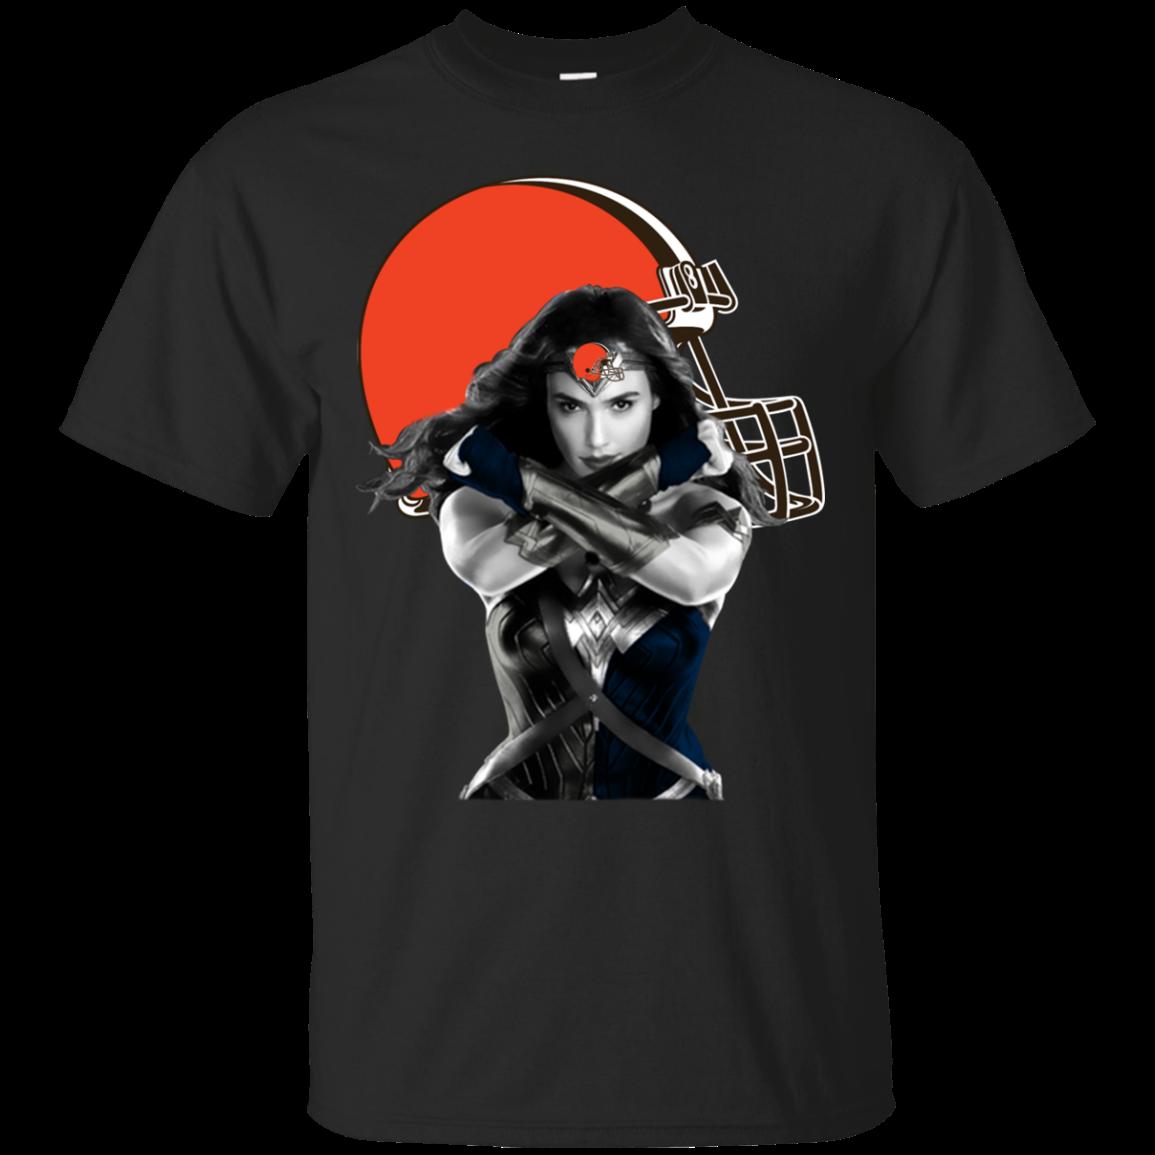 Order Wonder Woman Cleveland Browns T Shirt